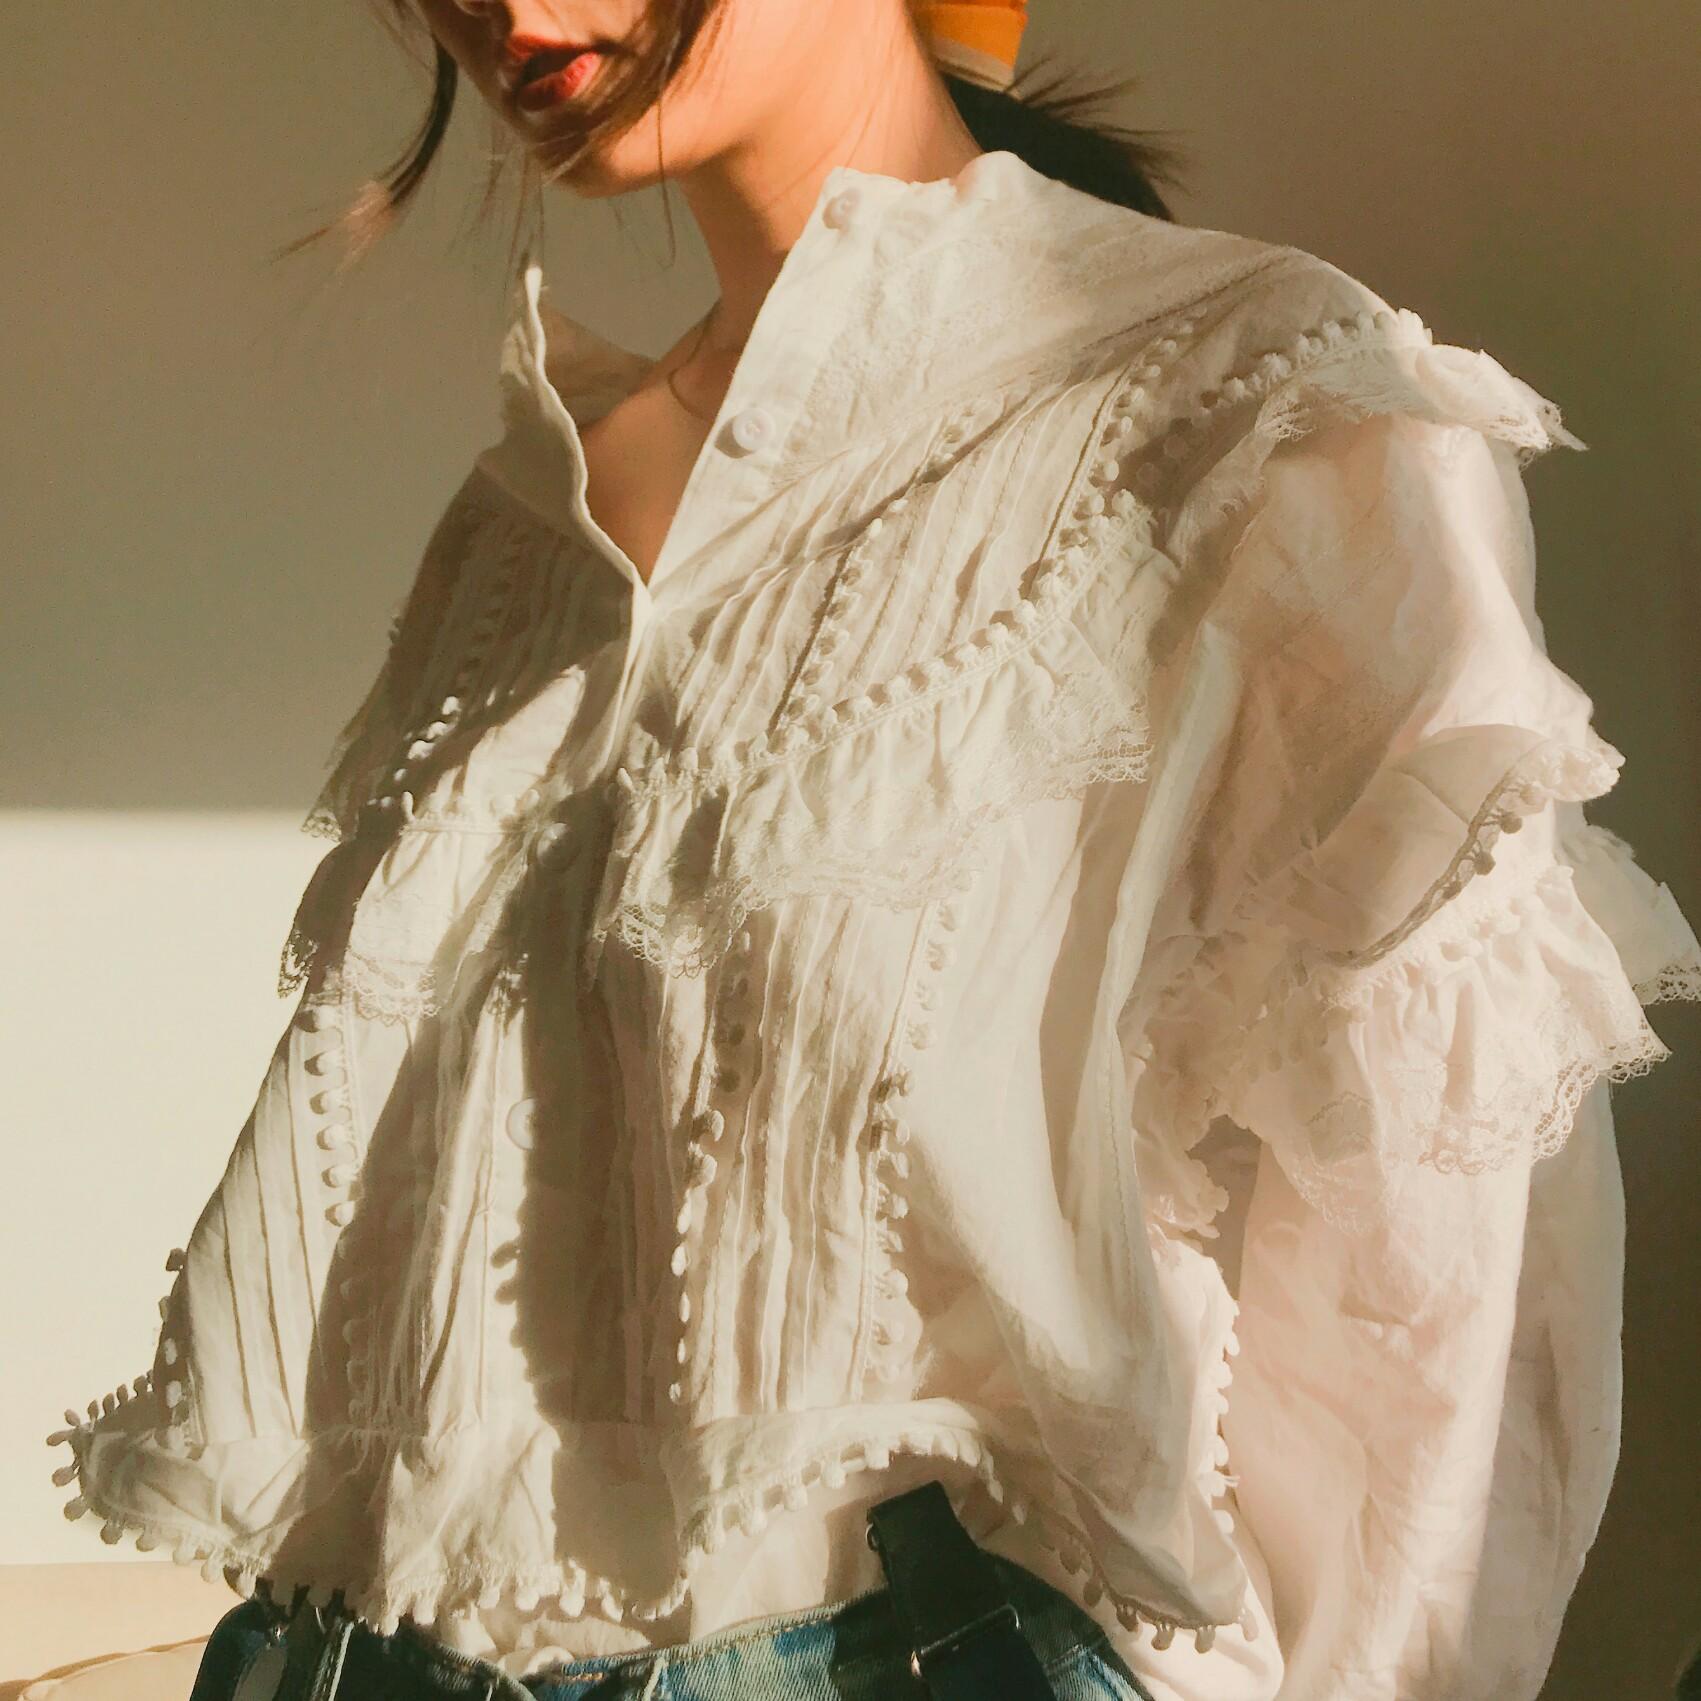 【LVY】吕颖同款 时尚甜美蕾丝花边白衬衫女圆领宽松喇叭长袖上衣